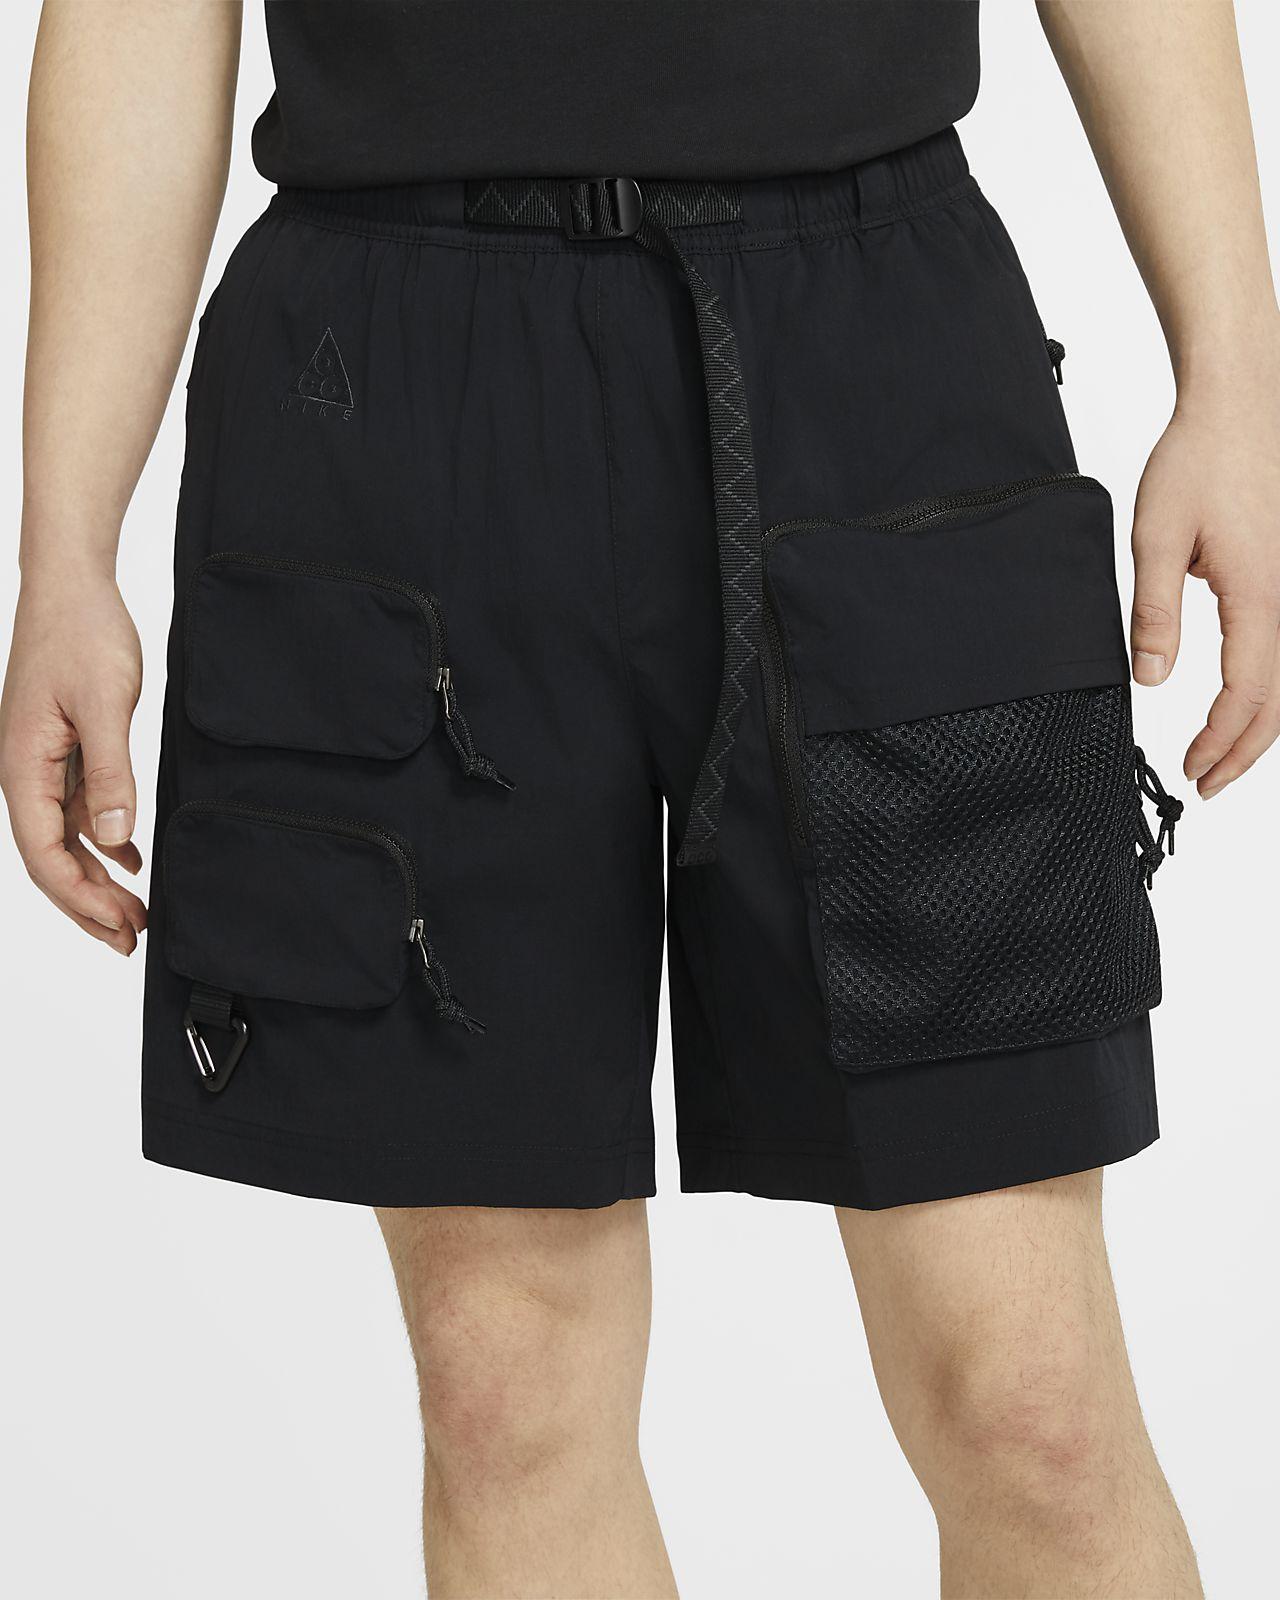 mens cargo shorts online